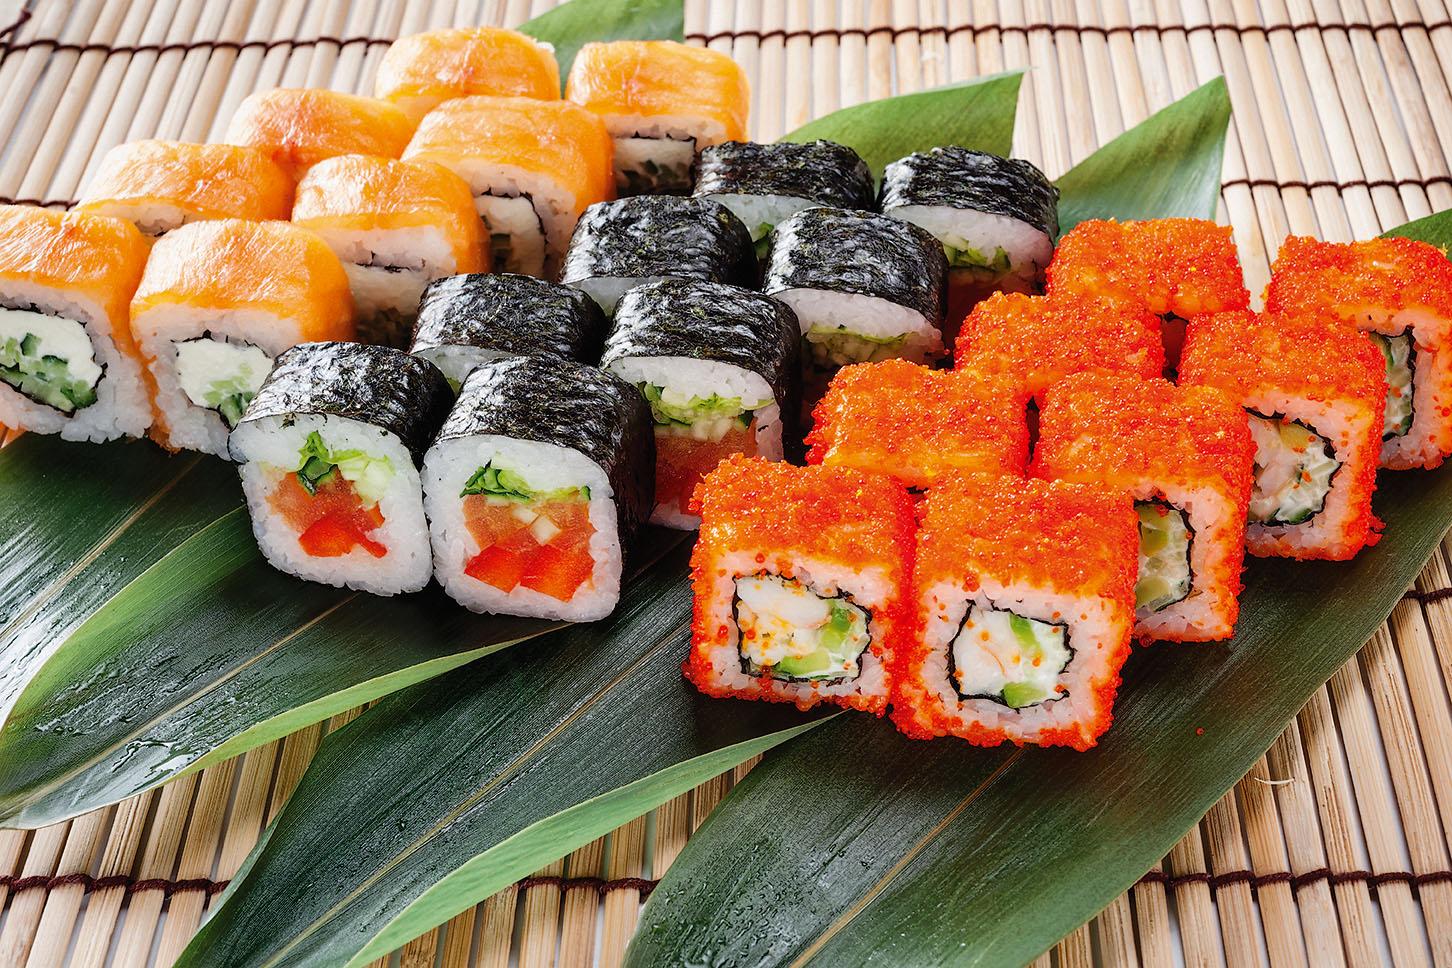 Готовим суши в домашних условиях: пошаговое руководство